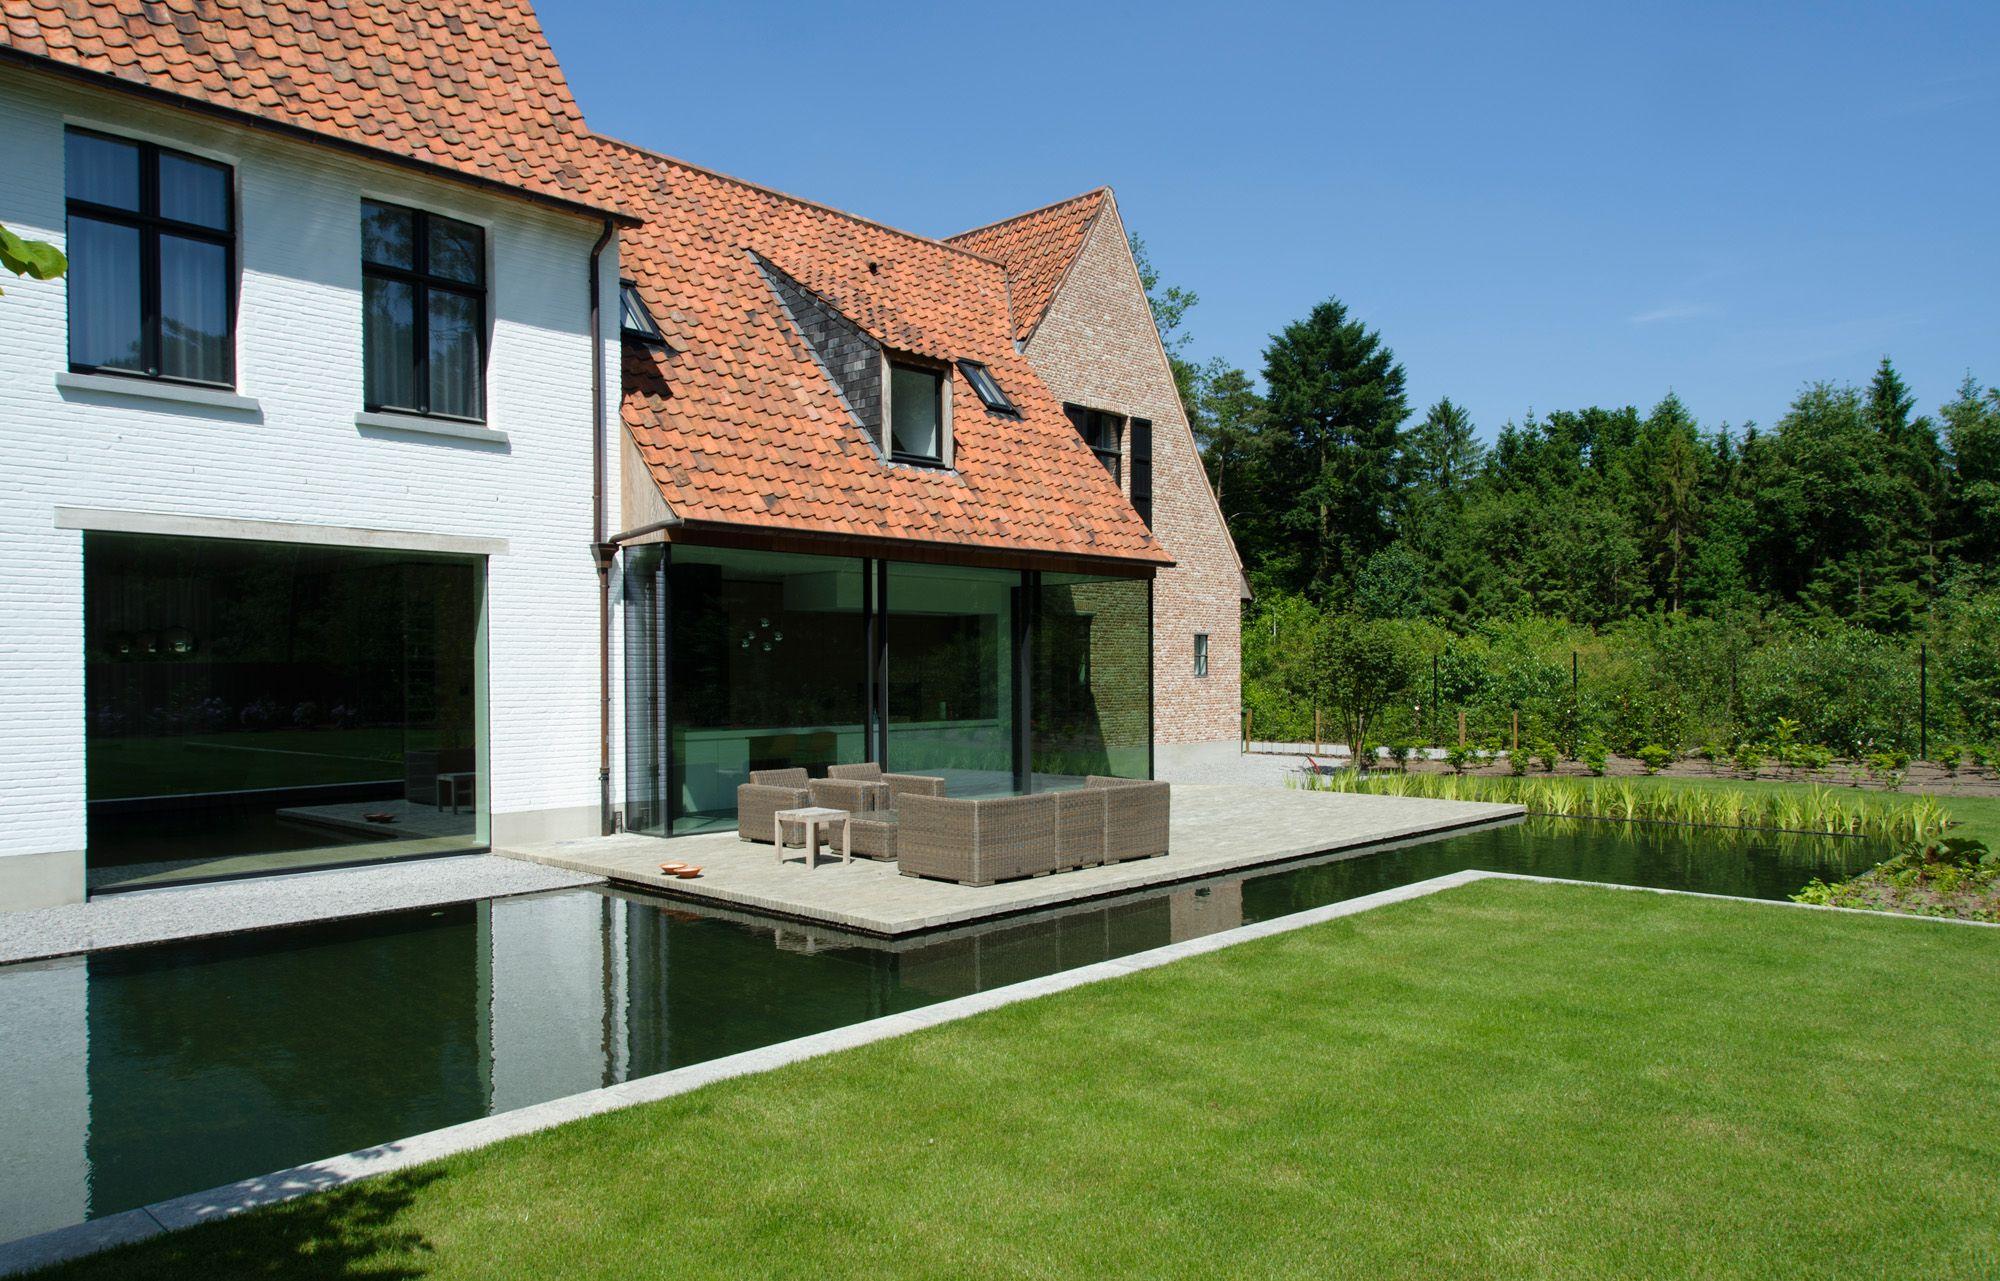 Vlaams landhuis pulle vlassak architects house pinterest interieurarchitectuur - Architectuur renovatie ...